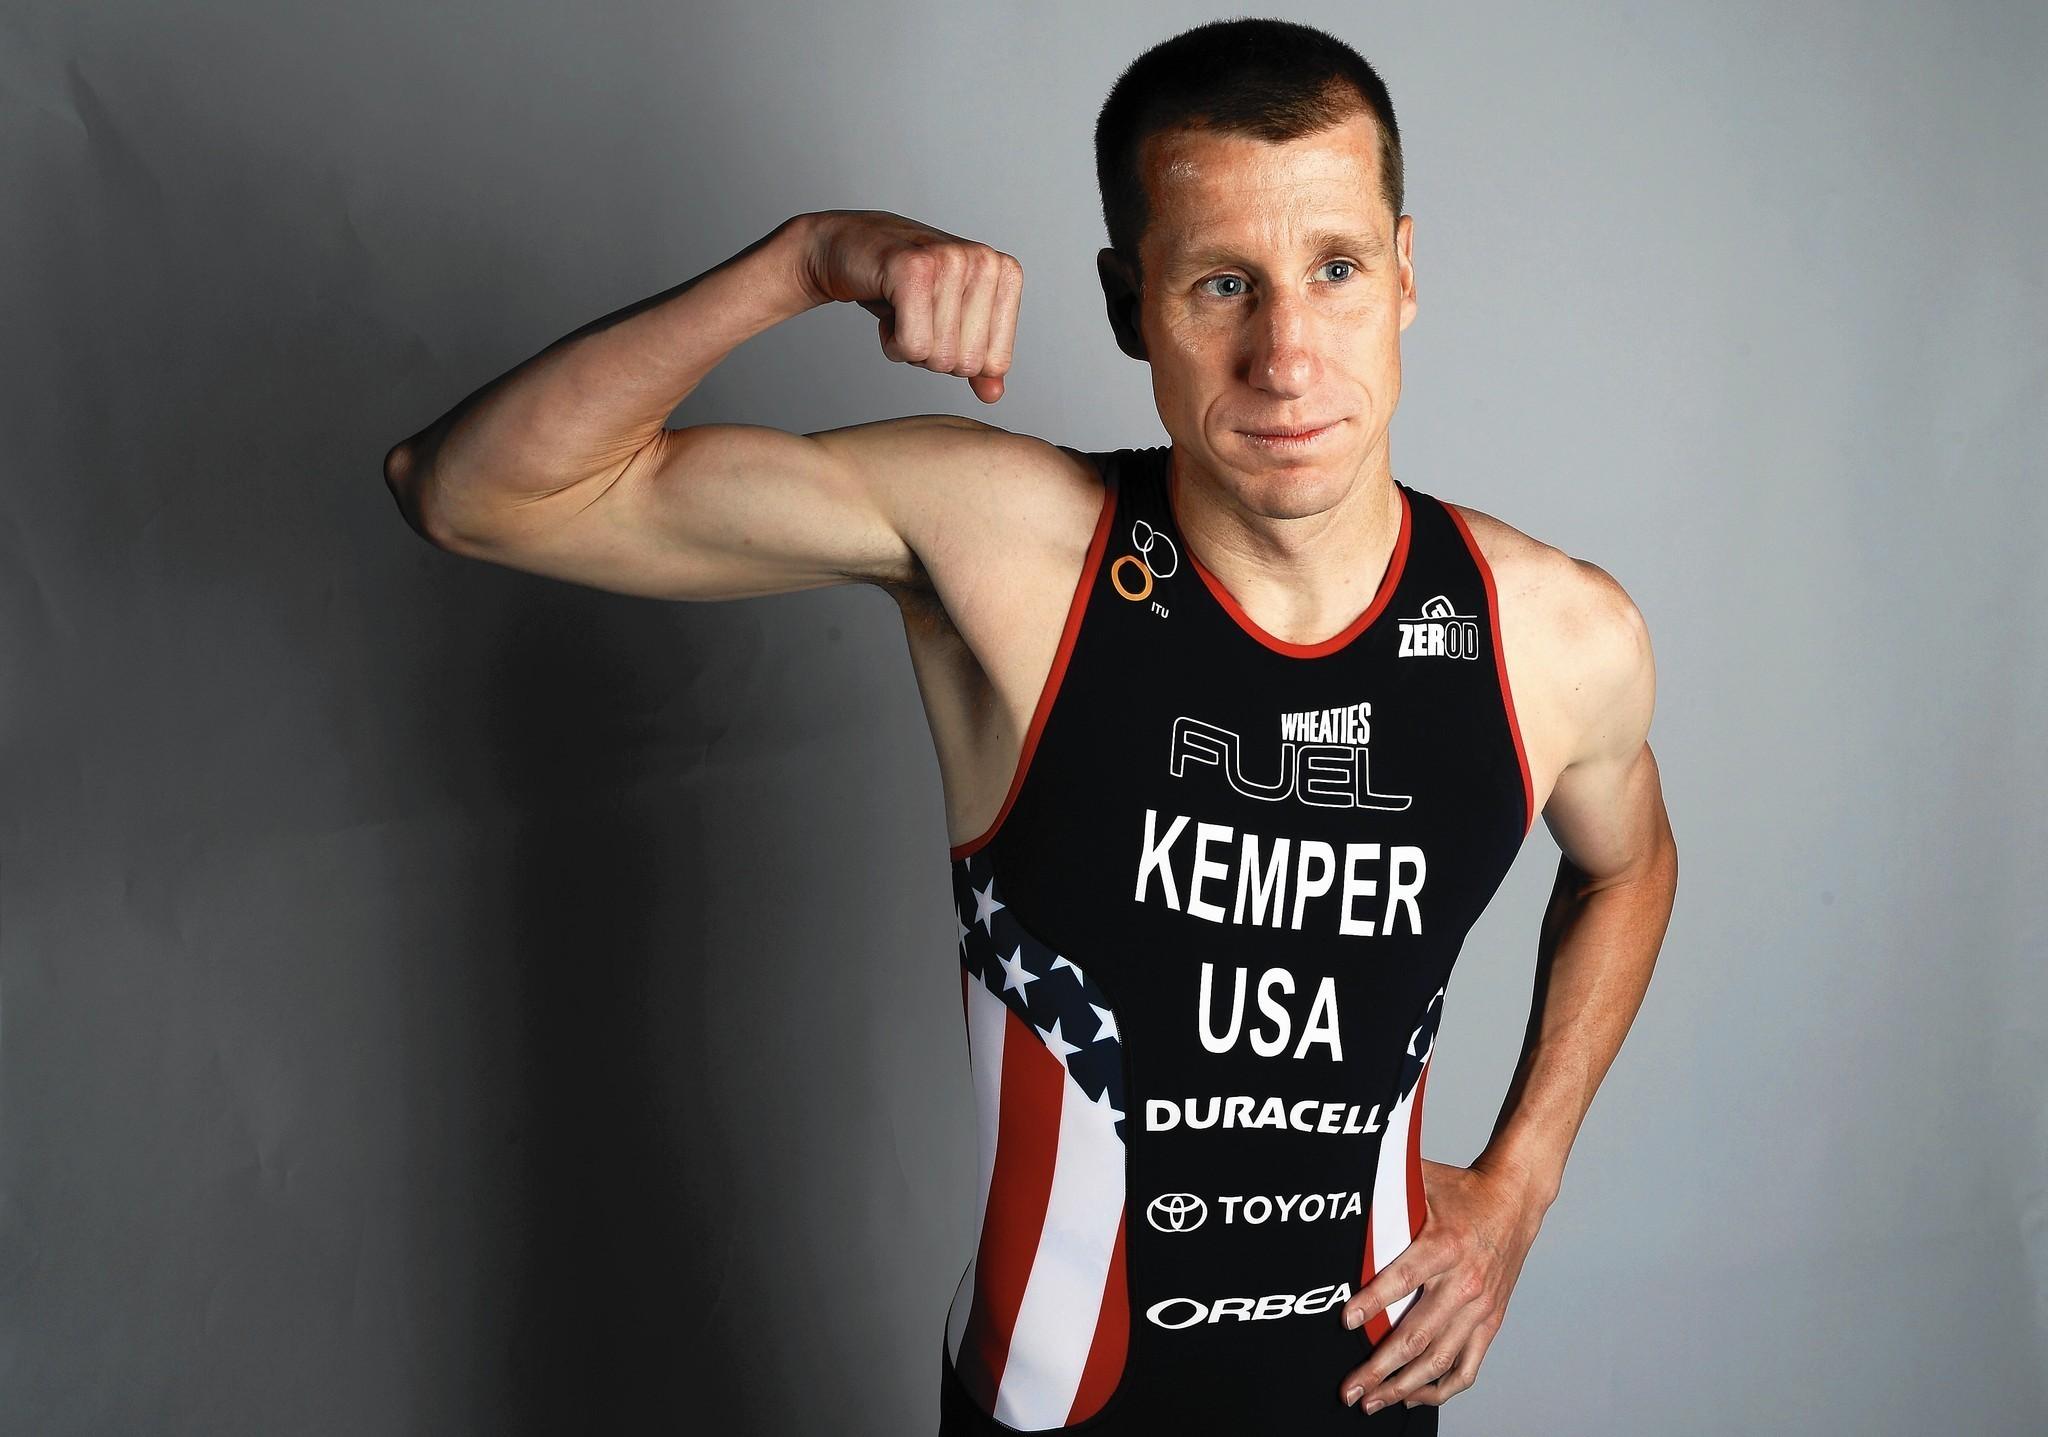 Hunter Kemper won't compete in 5th Olympic triathlon - Orlando Sentinel